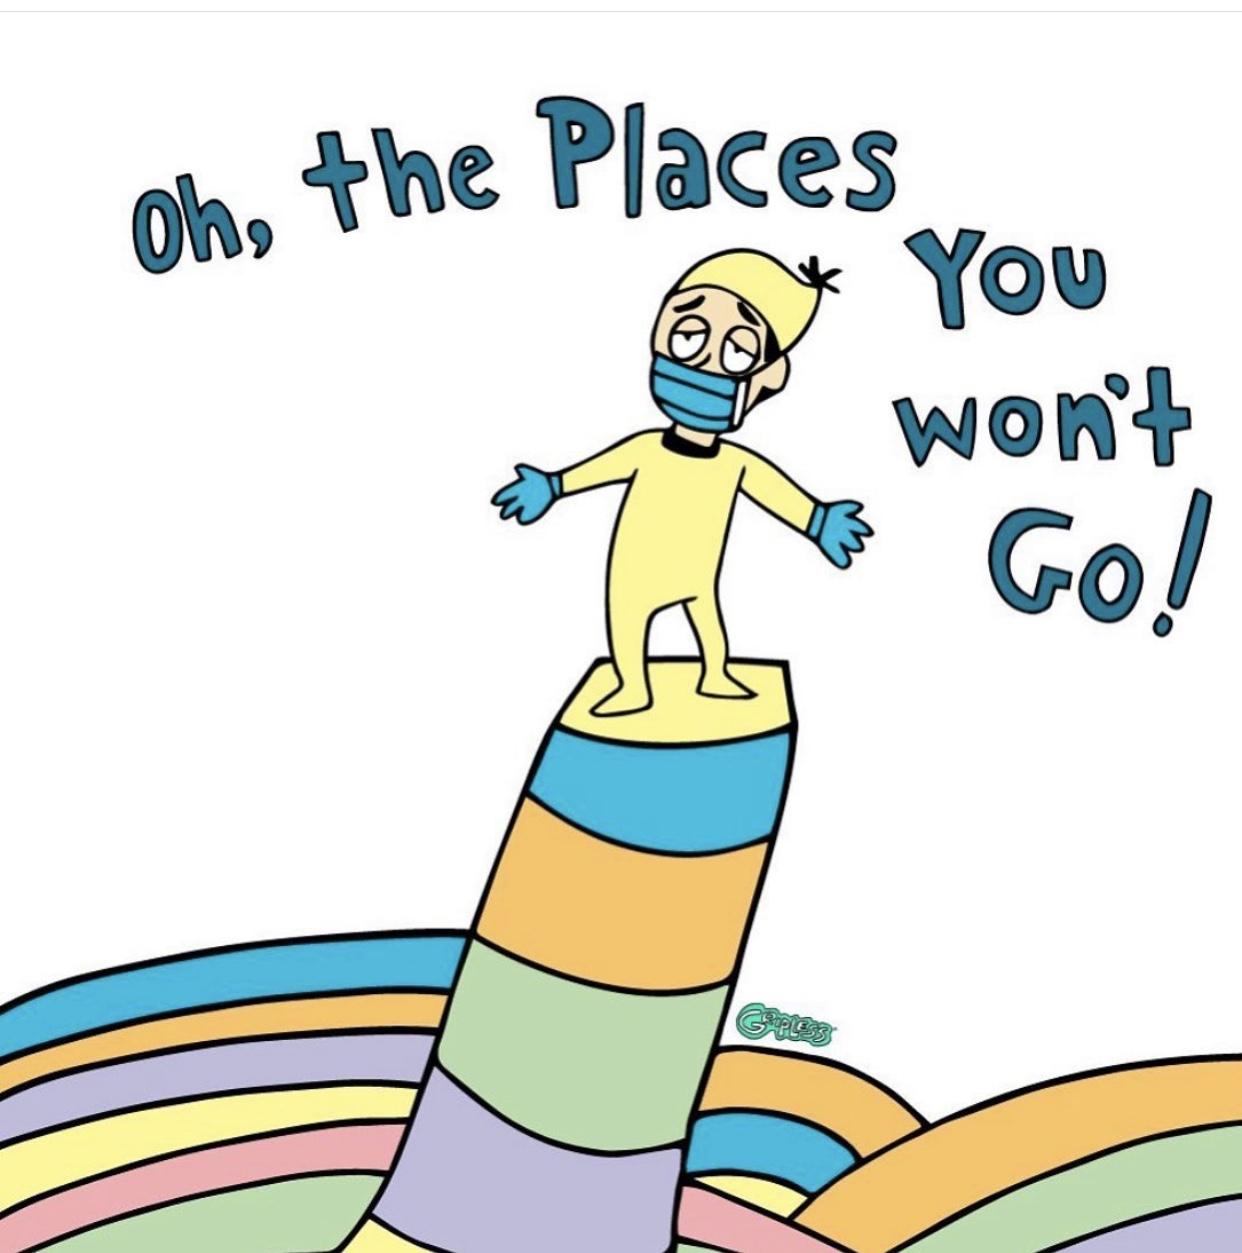 rainbow corona virus, dr seuss, oh the places you'll go, corona virus memes